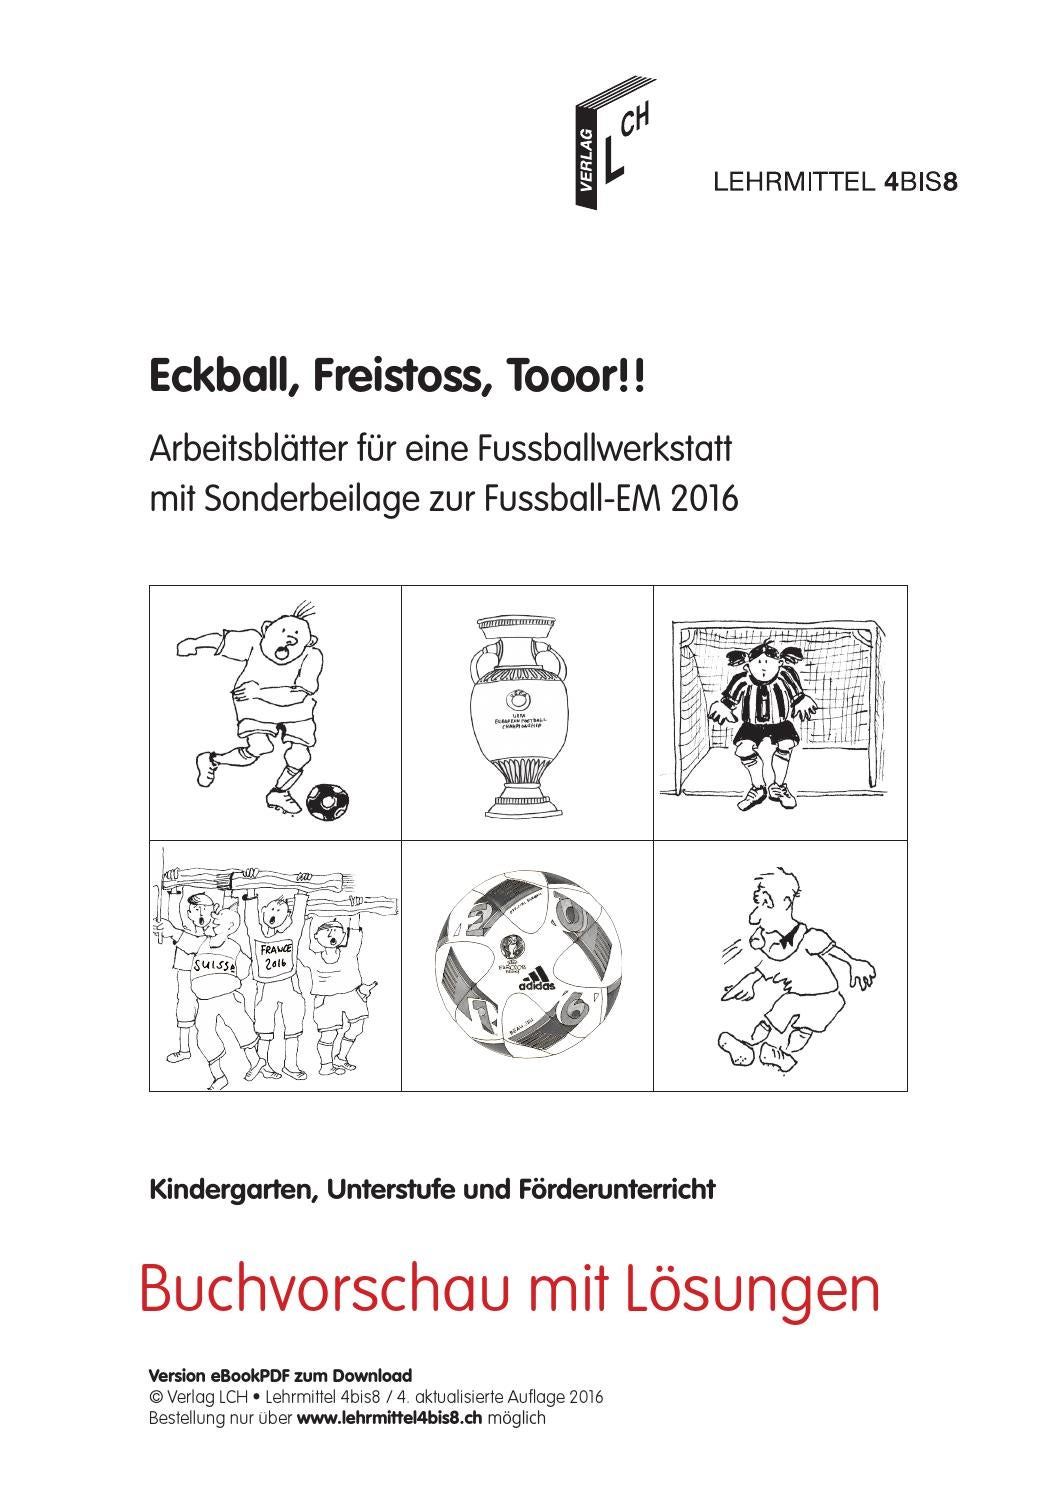 Eckball, Freistoss, Tooor!! by lehrmittel 4bis8 - issuu